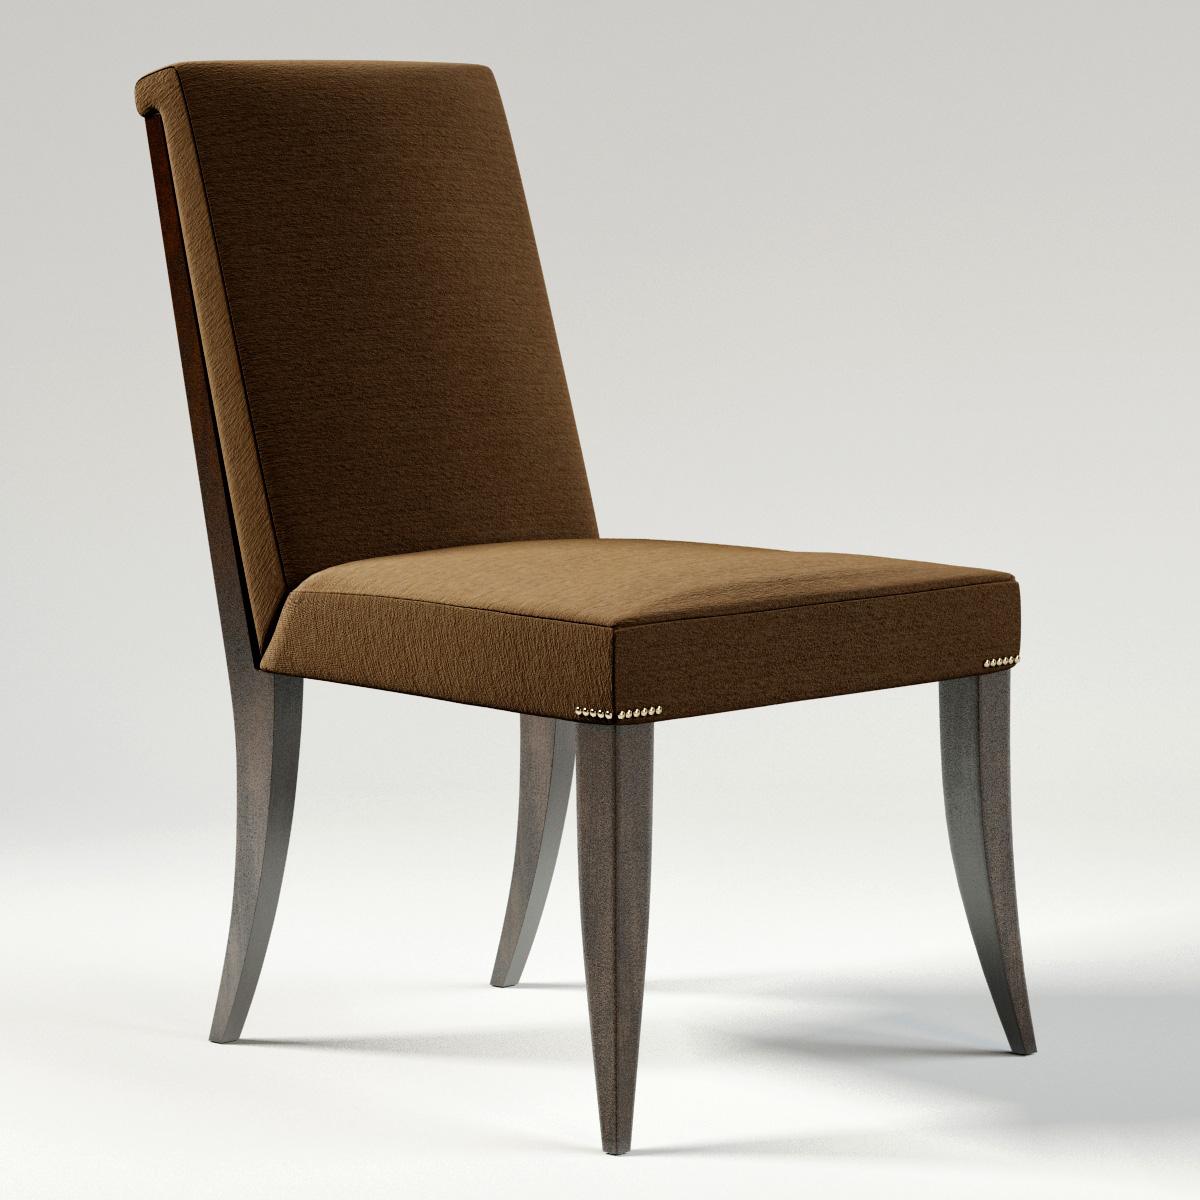 Fantastic Atelier Dining Side Chair Evergreenethics Interior Chair Design Evergreenethicsorg